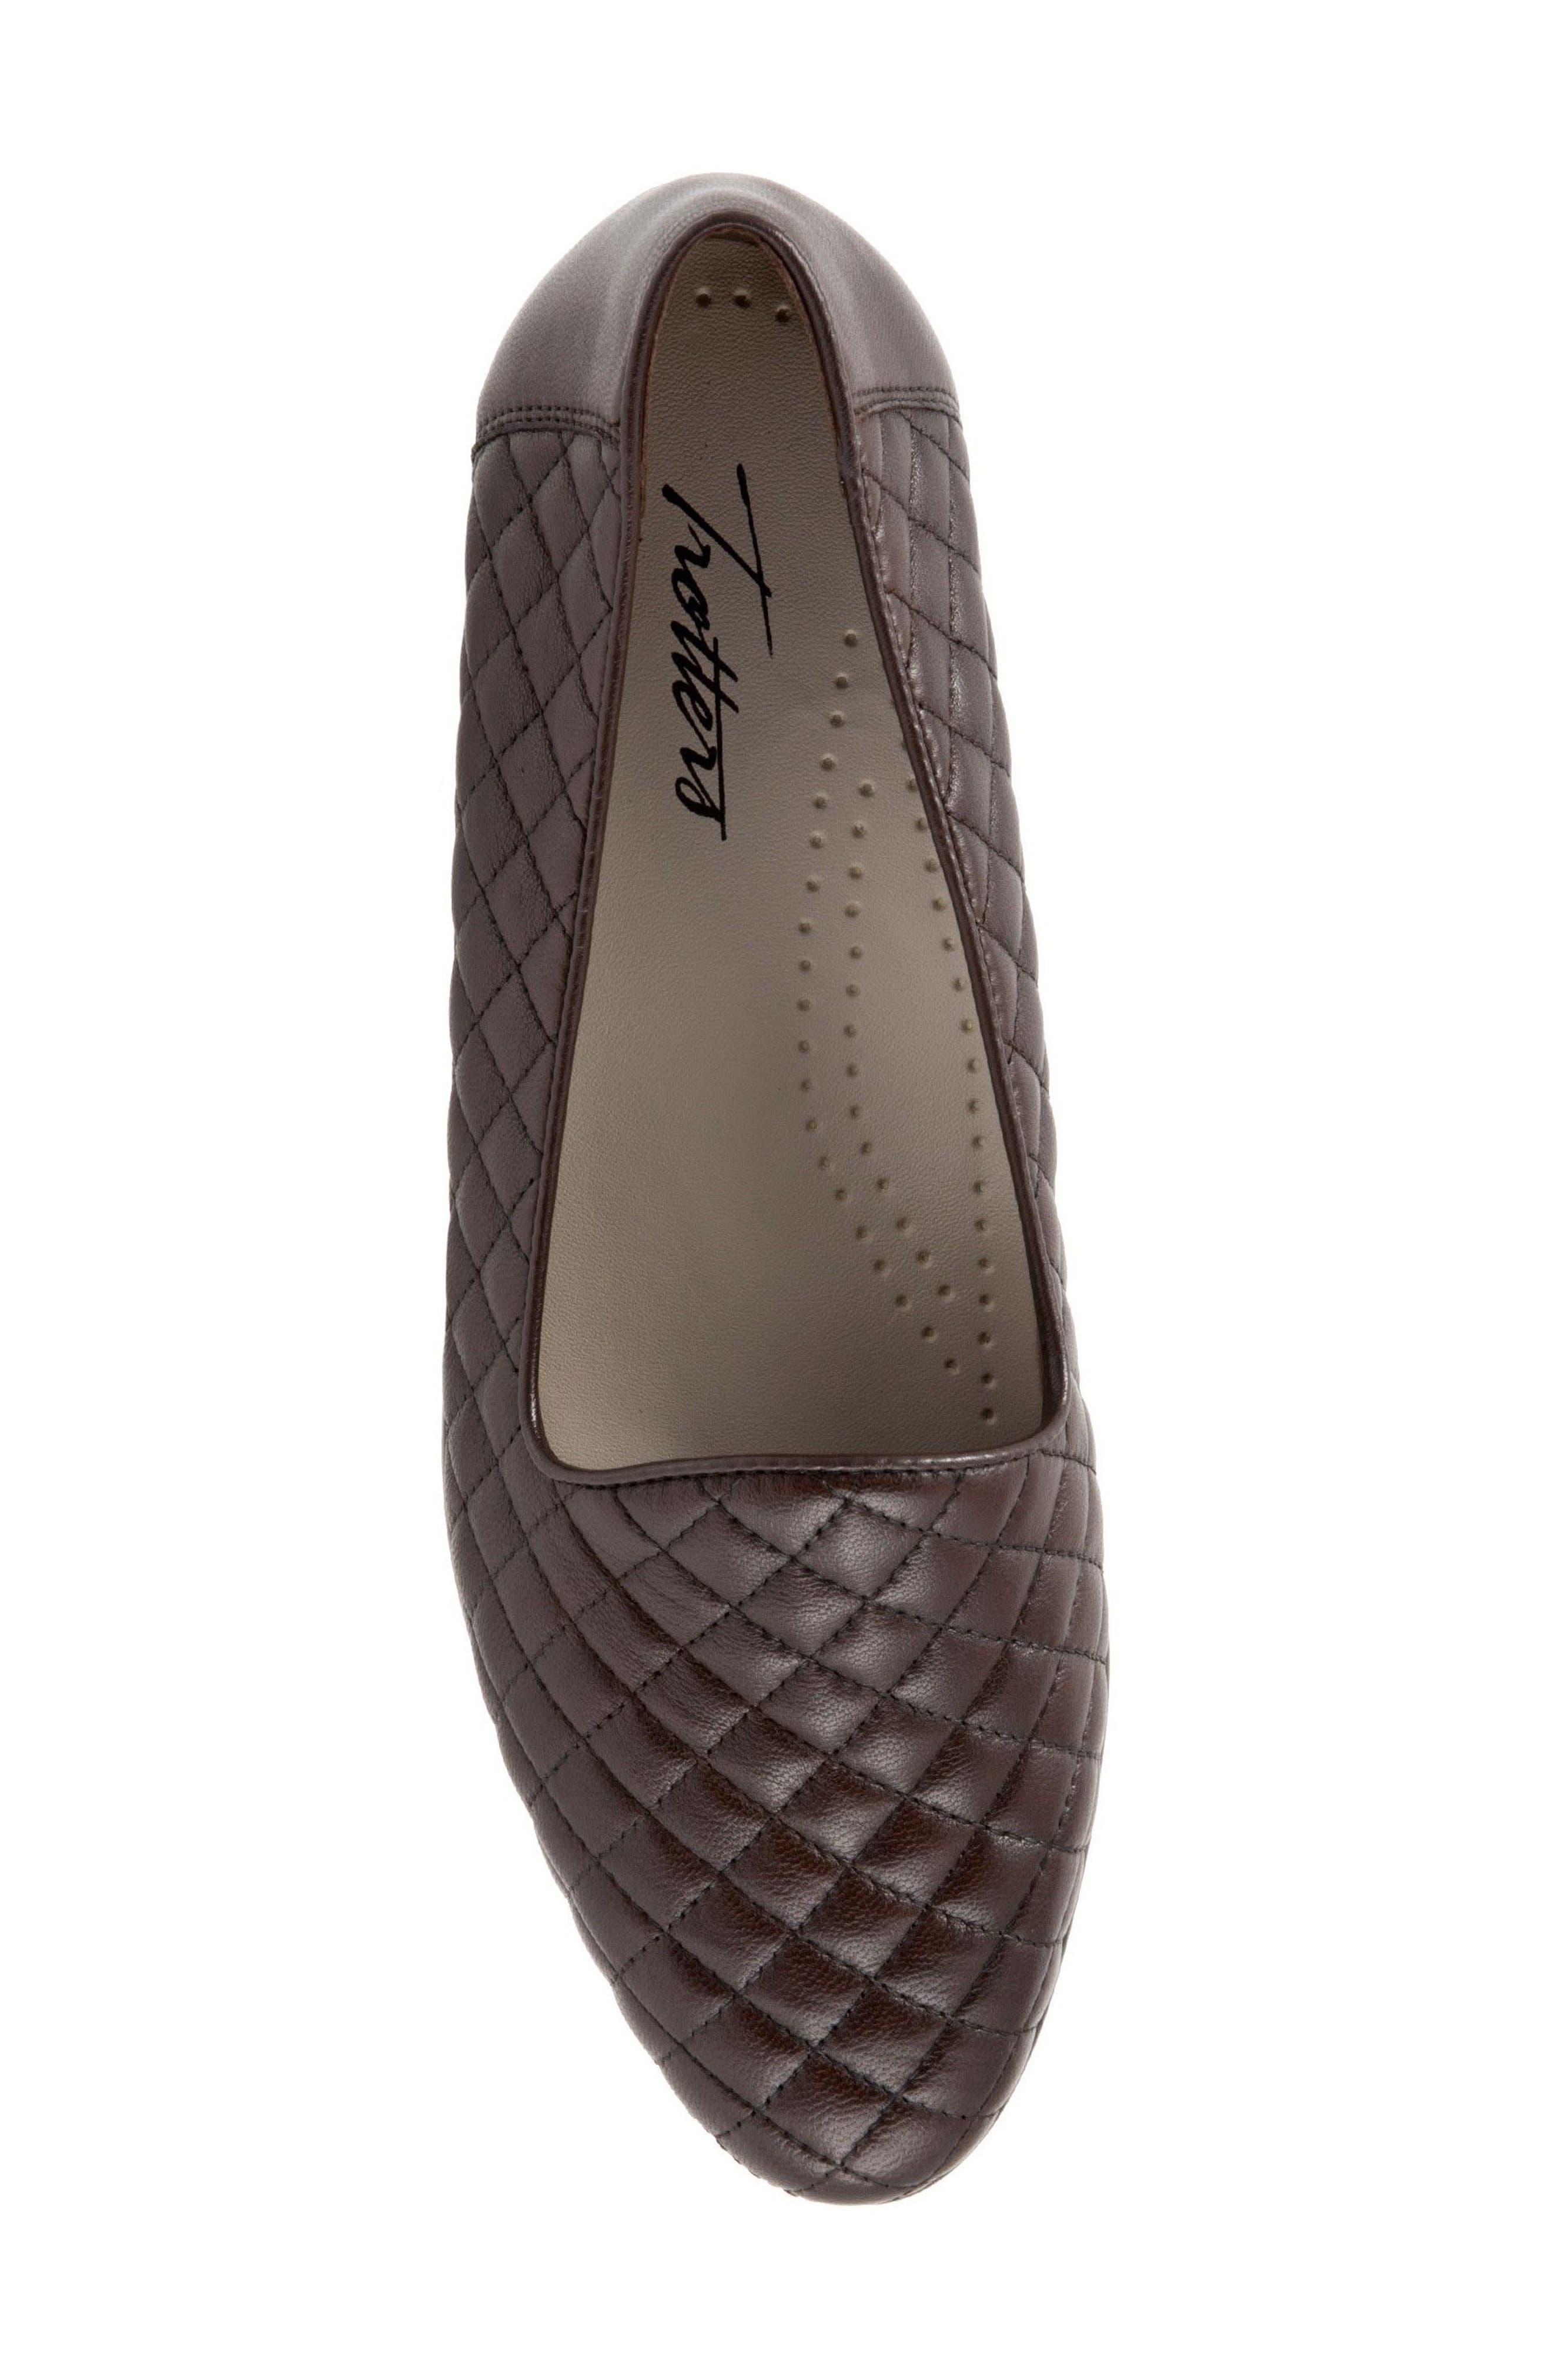 Liz Woven Loafer Flat,                             Alternate thumbnail 5, color,                             Dark Brown Leather